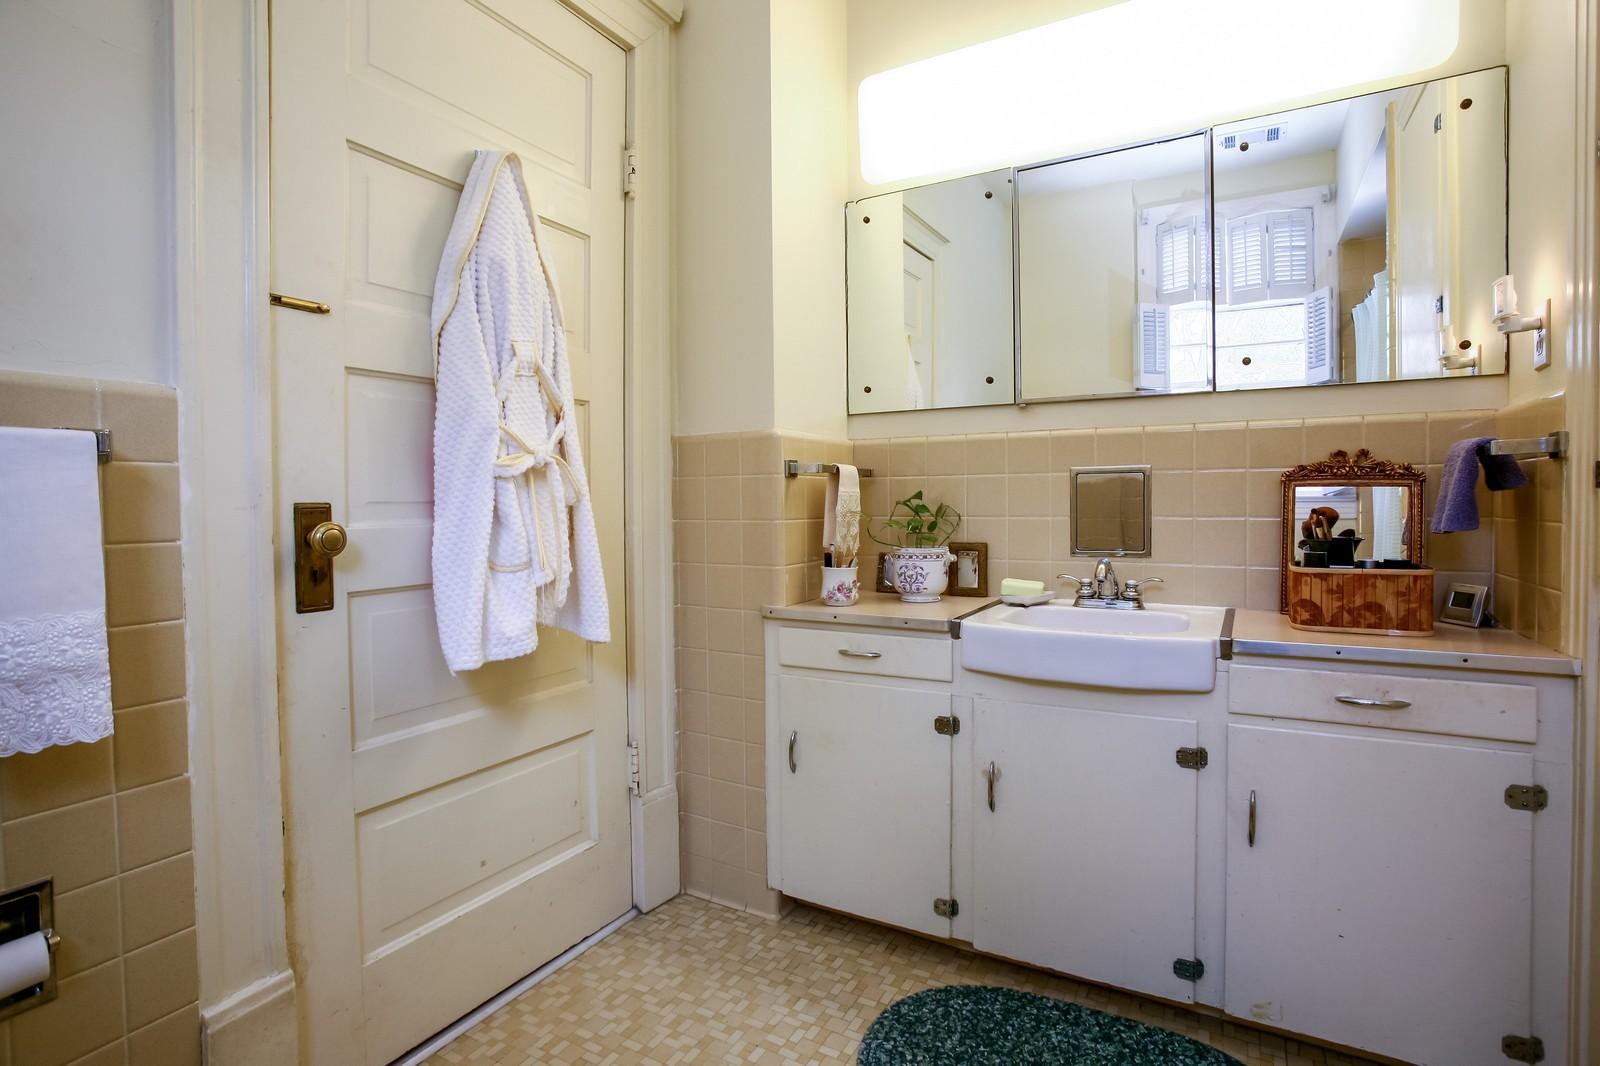 Real Estate Photography - 414 N 14th St, Lanett, AL, 36863 - 2nd Bathroom